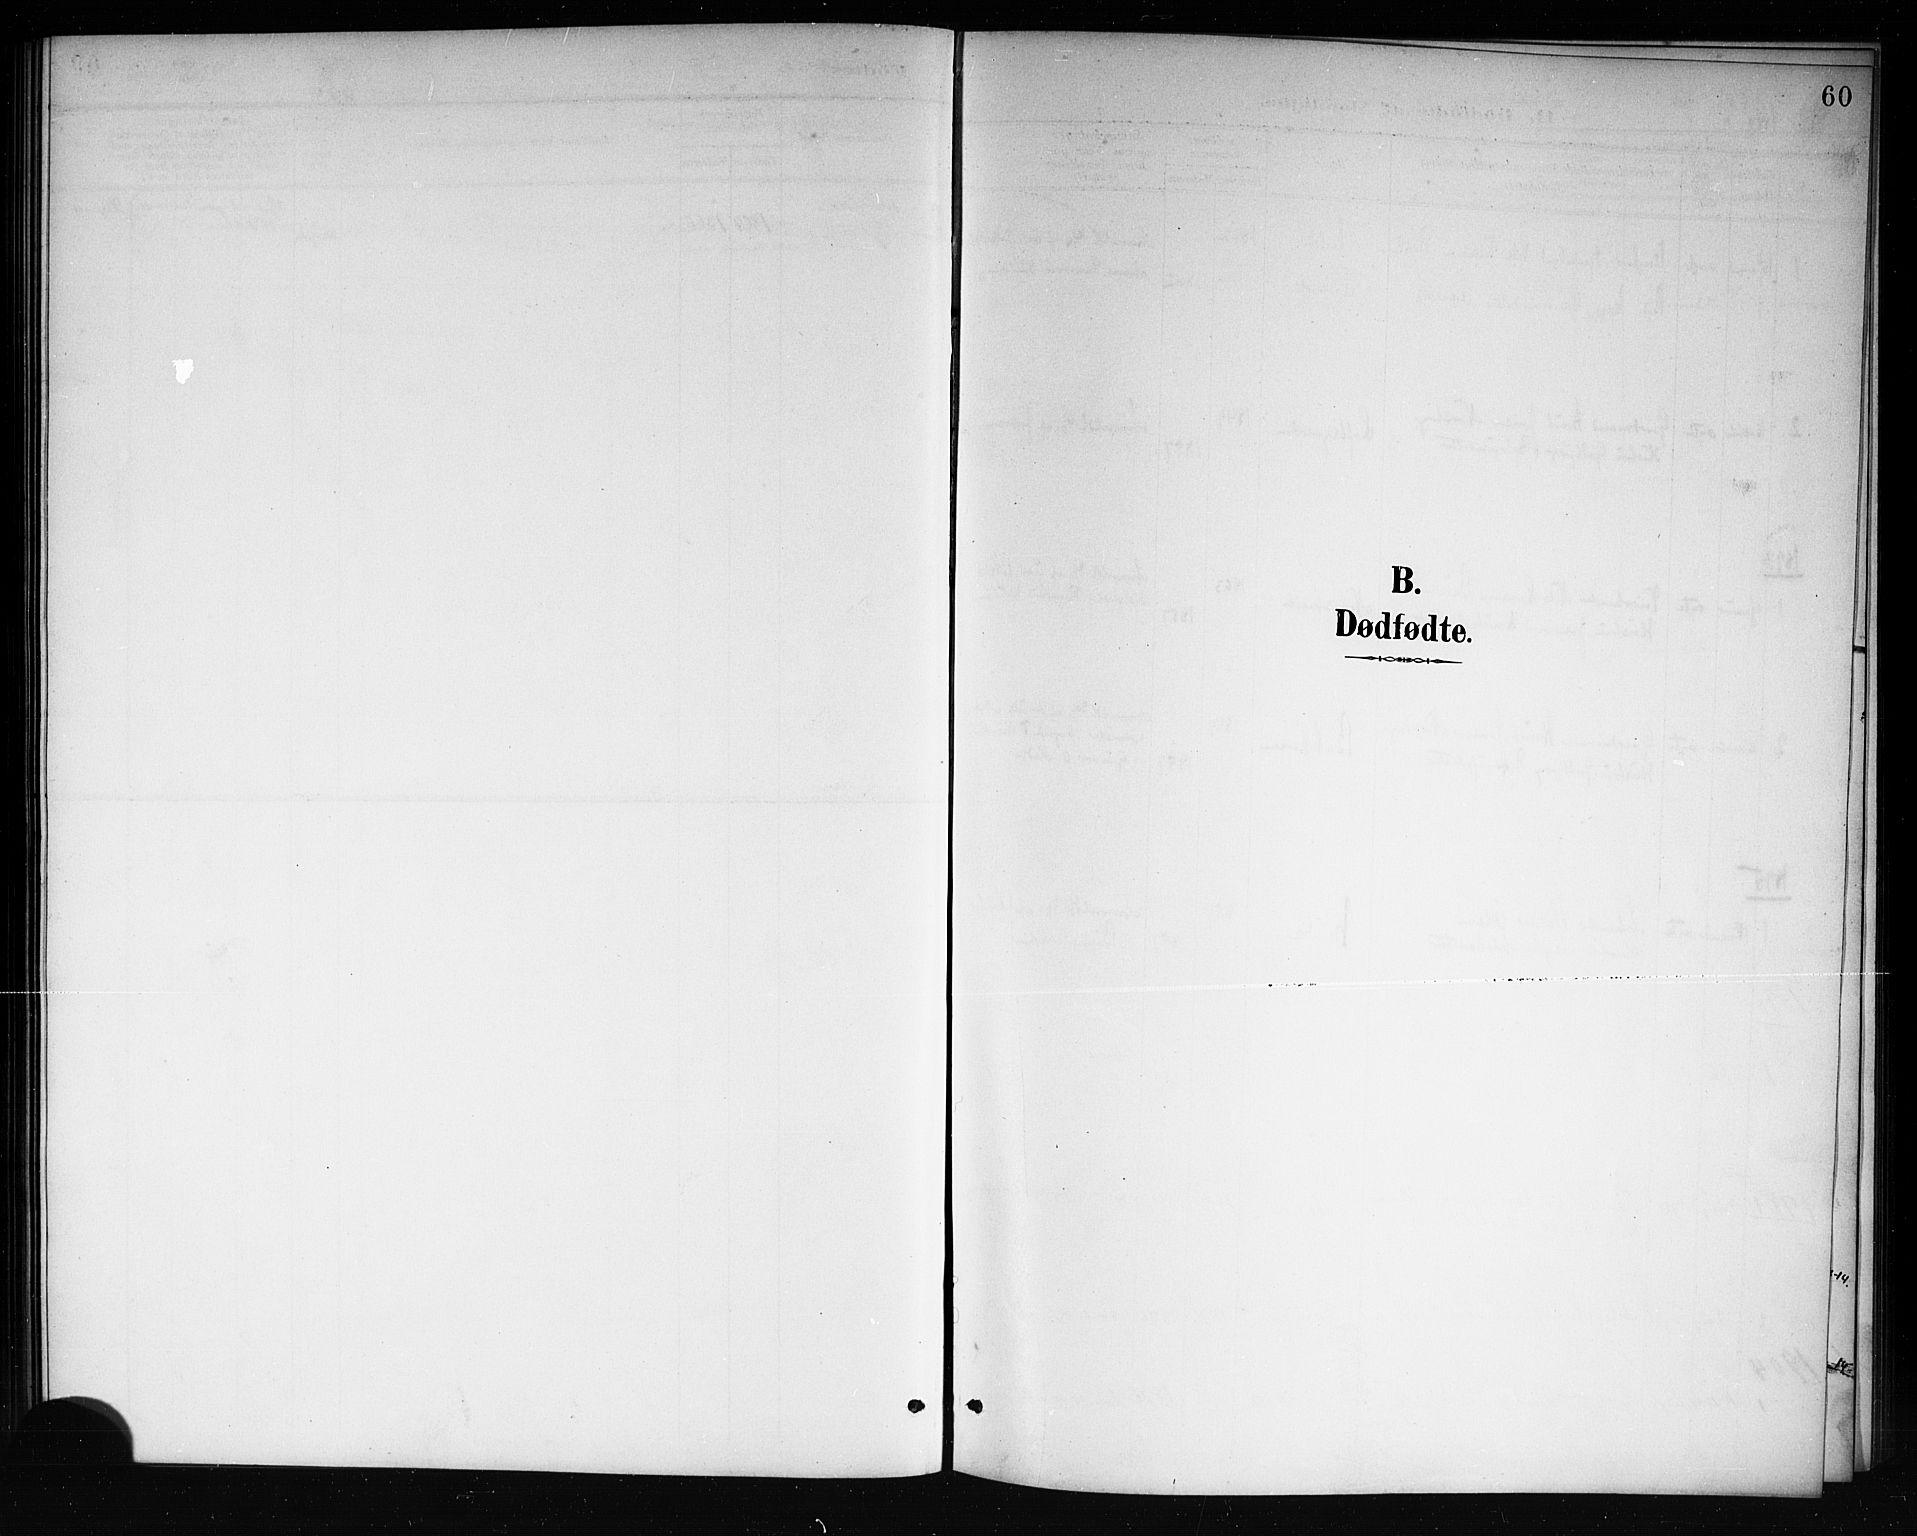 SAKO, Mo kirkebøker, G/Ga/L0002: Klokkerbok nr. I 2, 1892-1914, s. 60